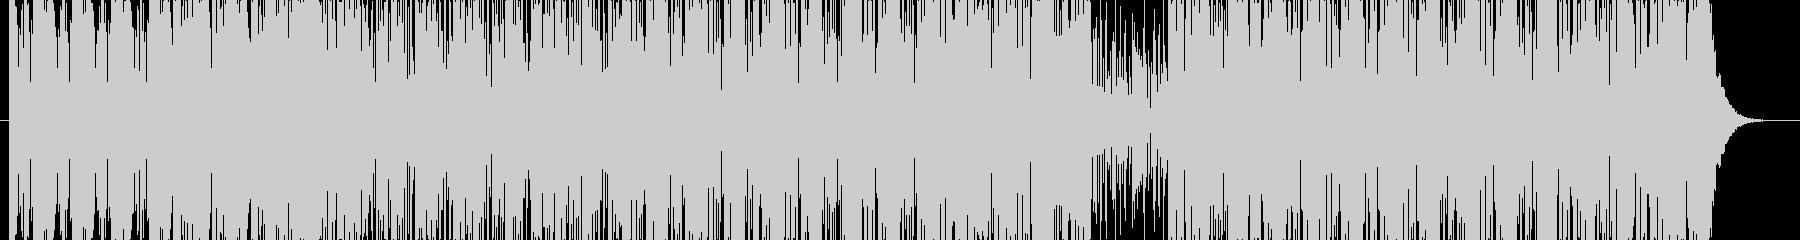 【RnB】ノリノリなラップの曲の未再生の波形